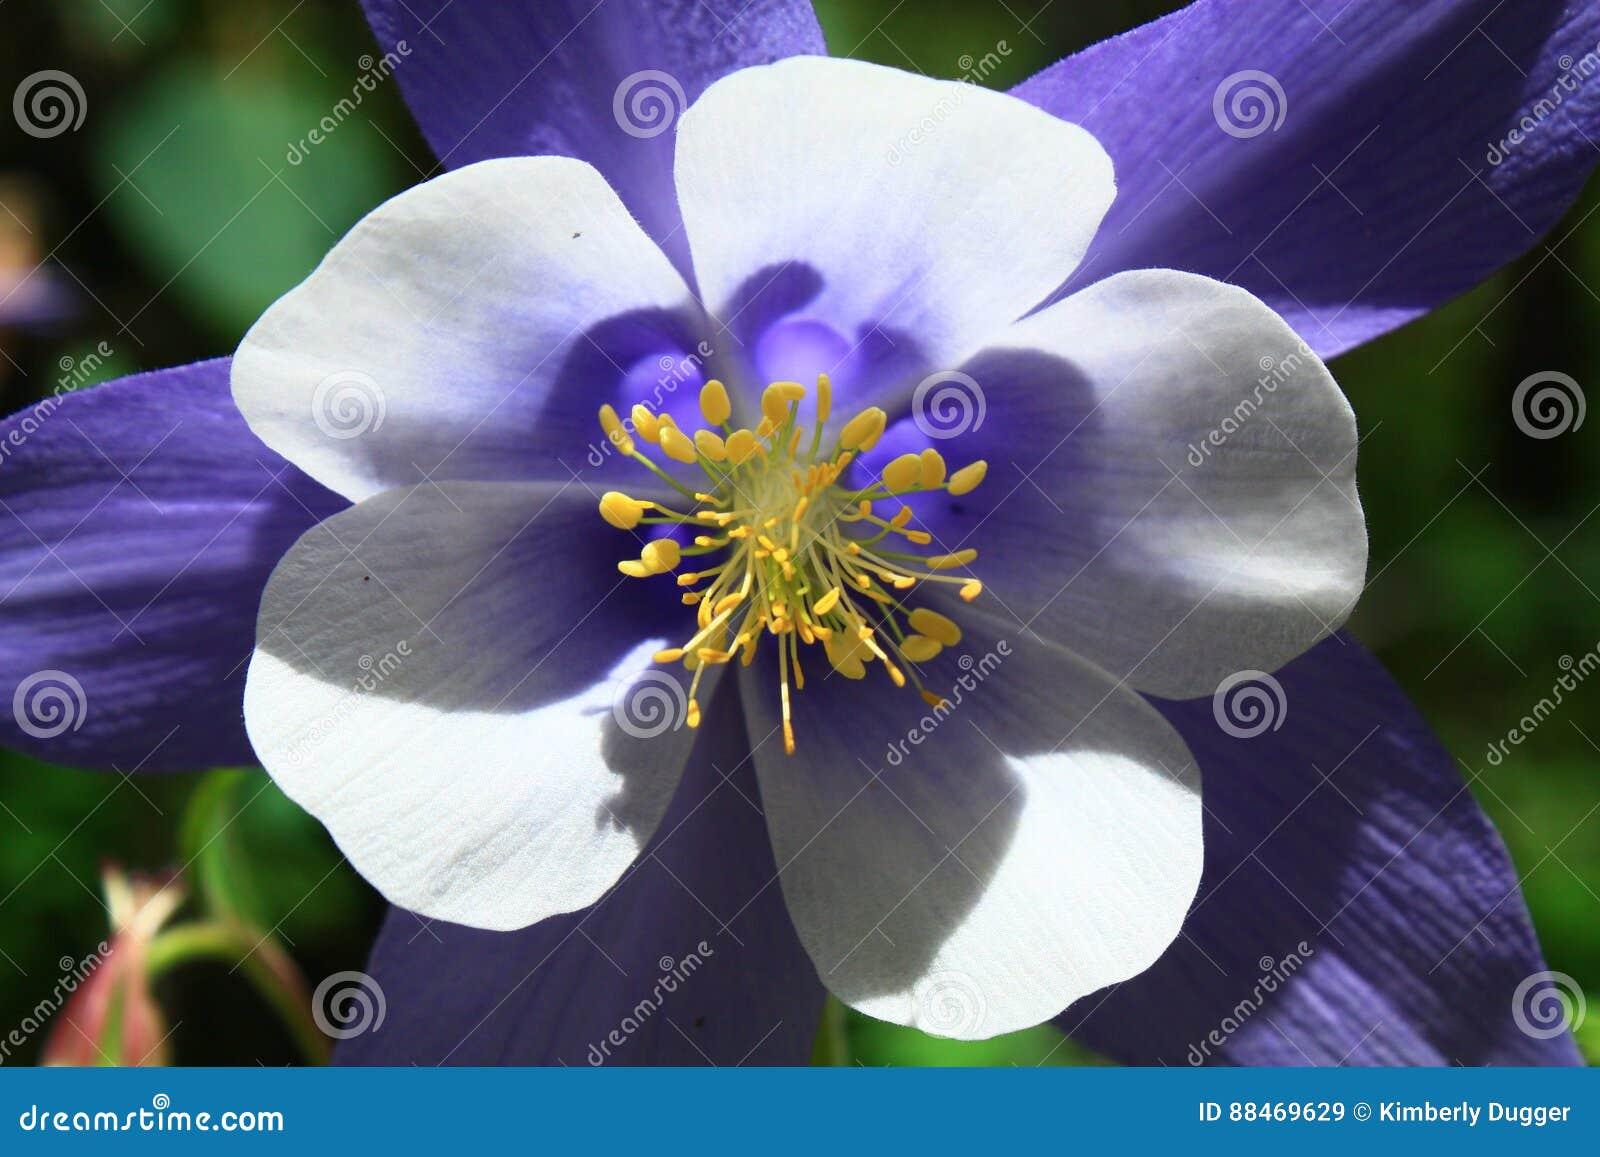 Blue Columbine Flower In Colorado Stock Image Image Of Wildflower